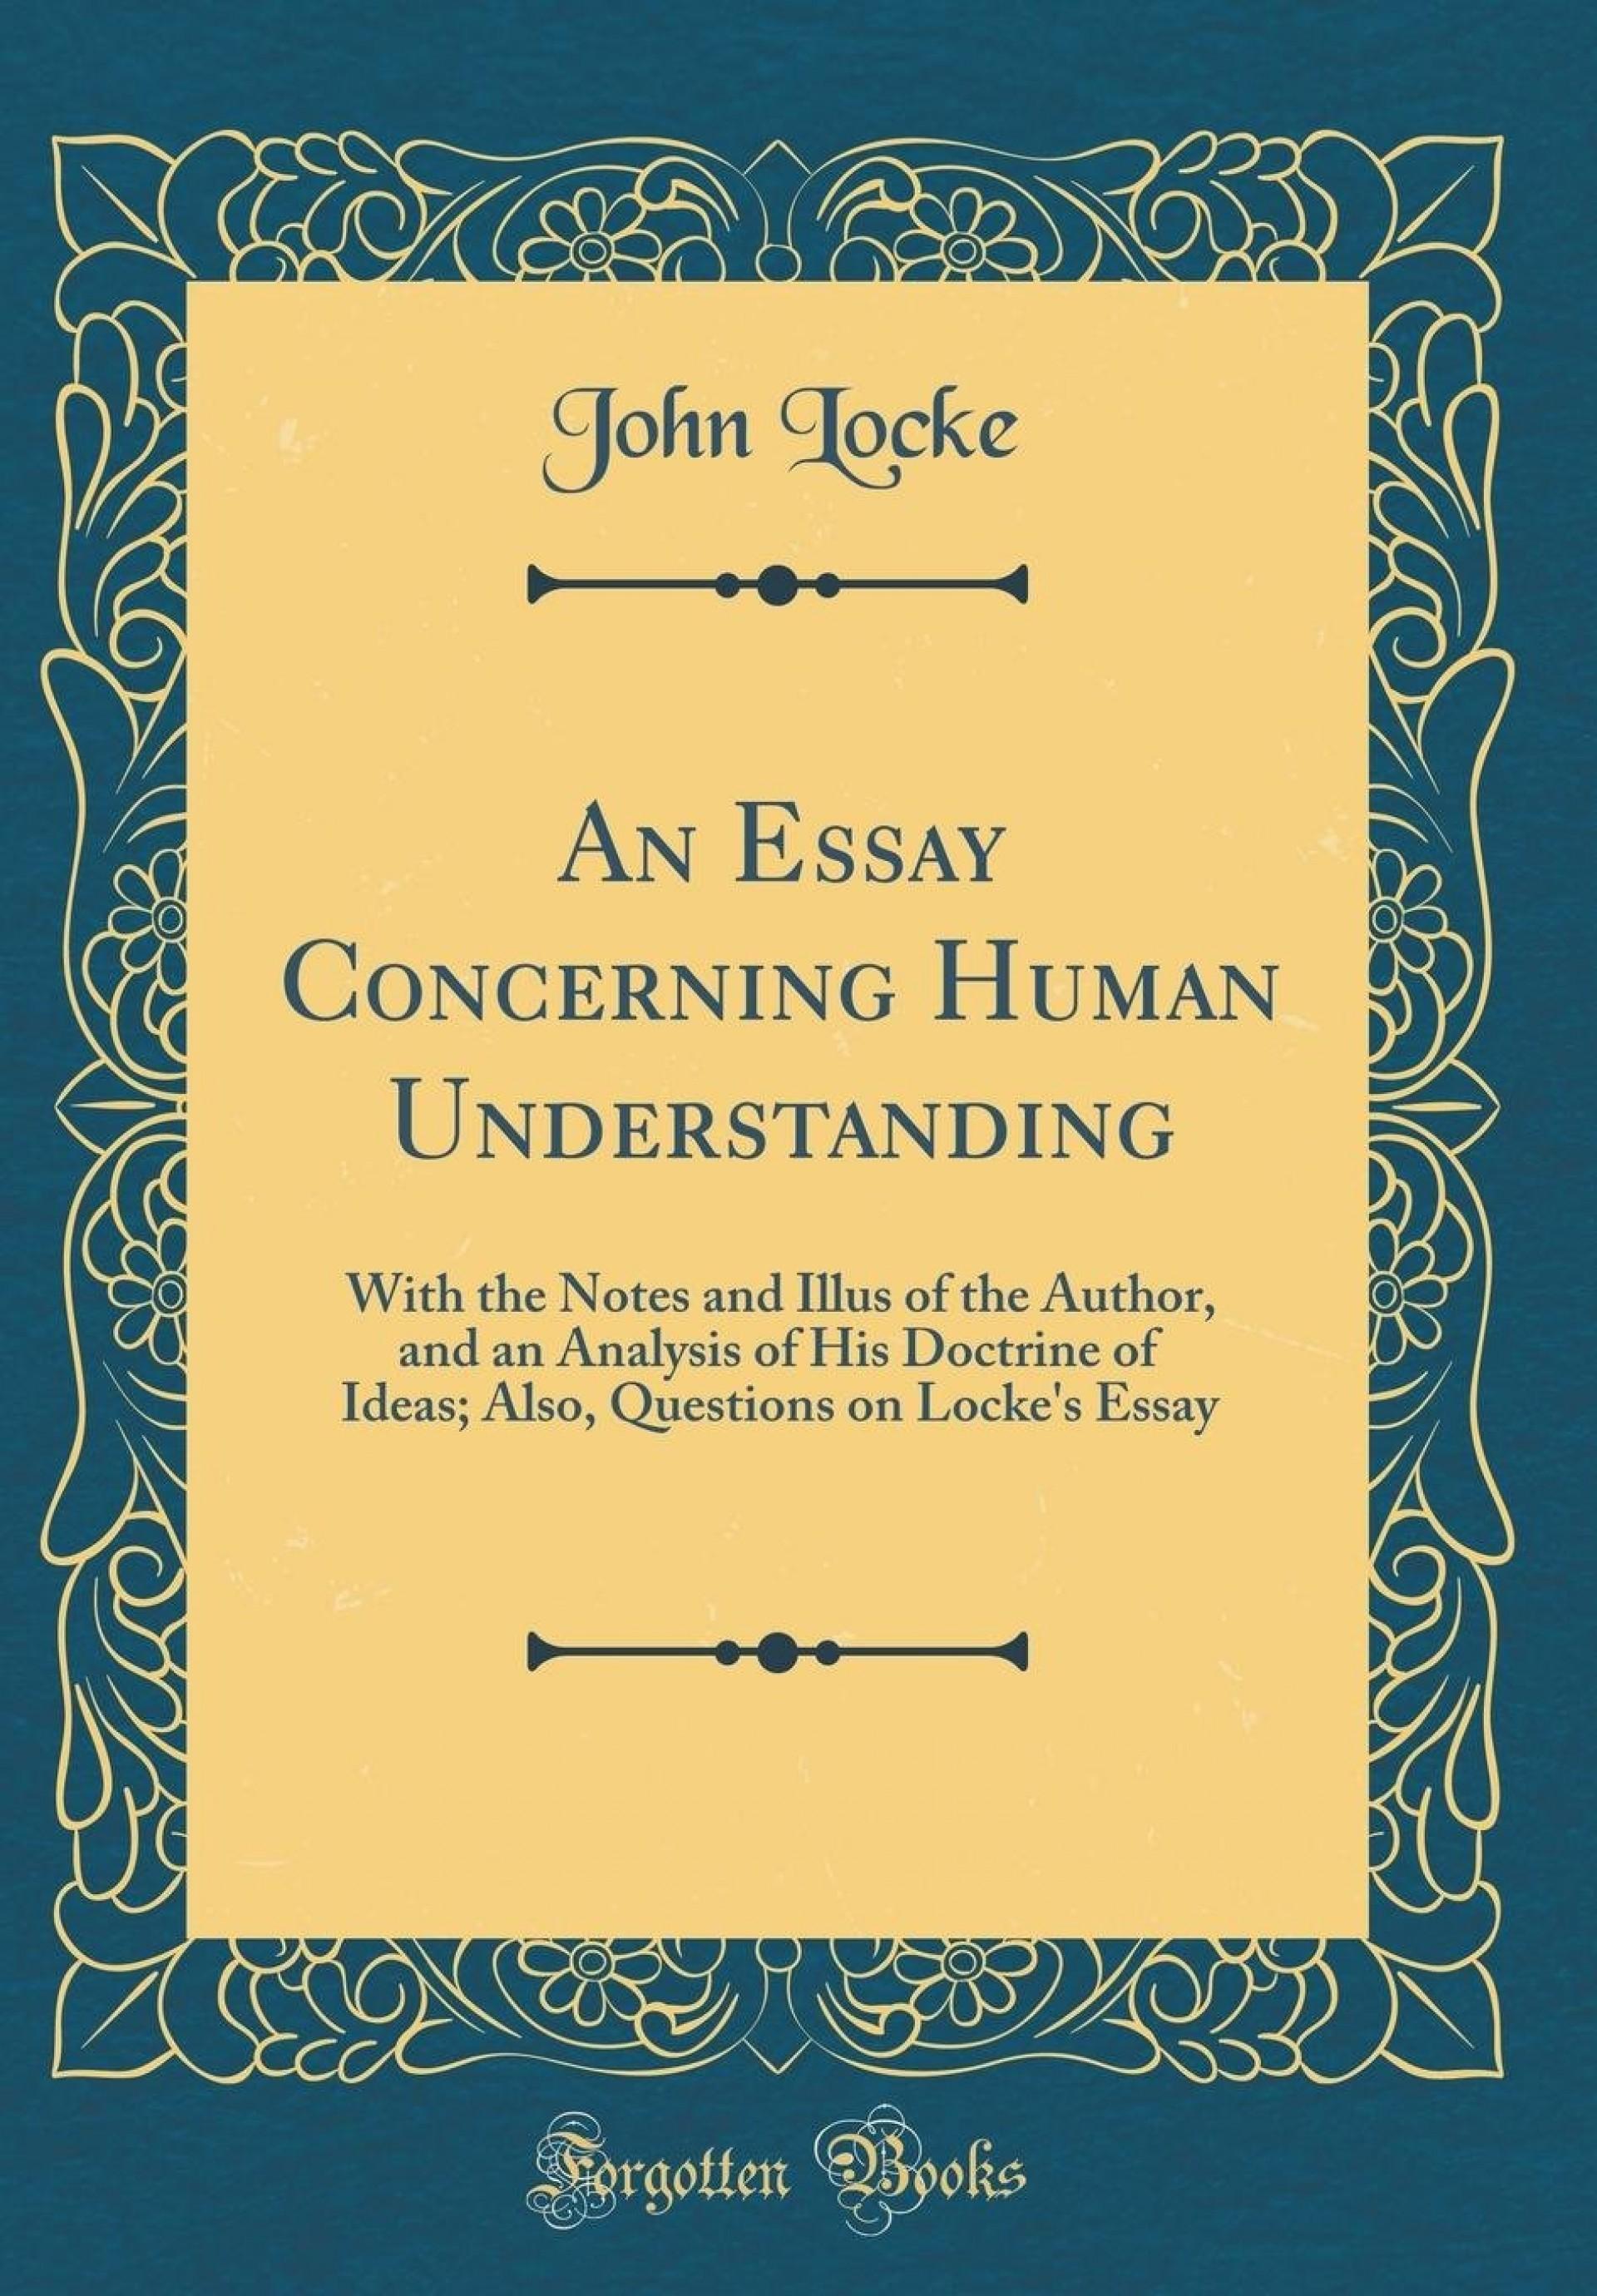 021 71zeizuftol John Locke Essay Impressive Concerning Human Understanding Book 4 On Pdf Summary 1920